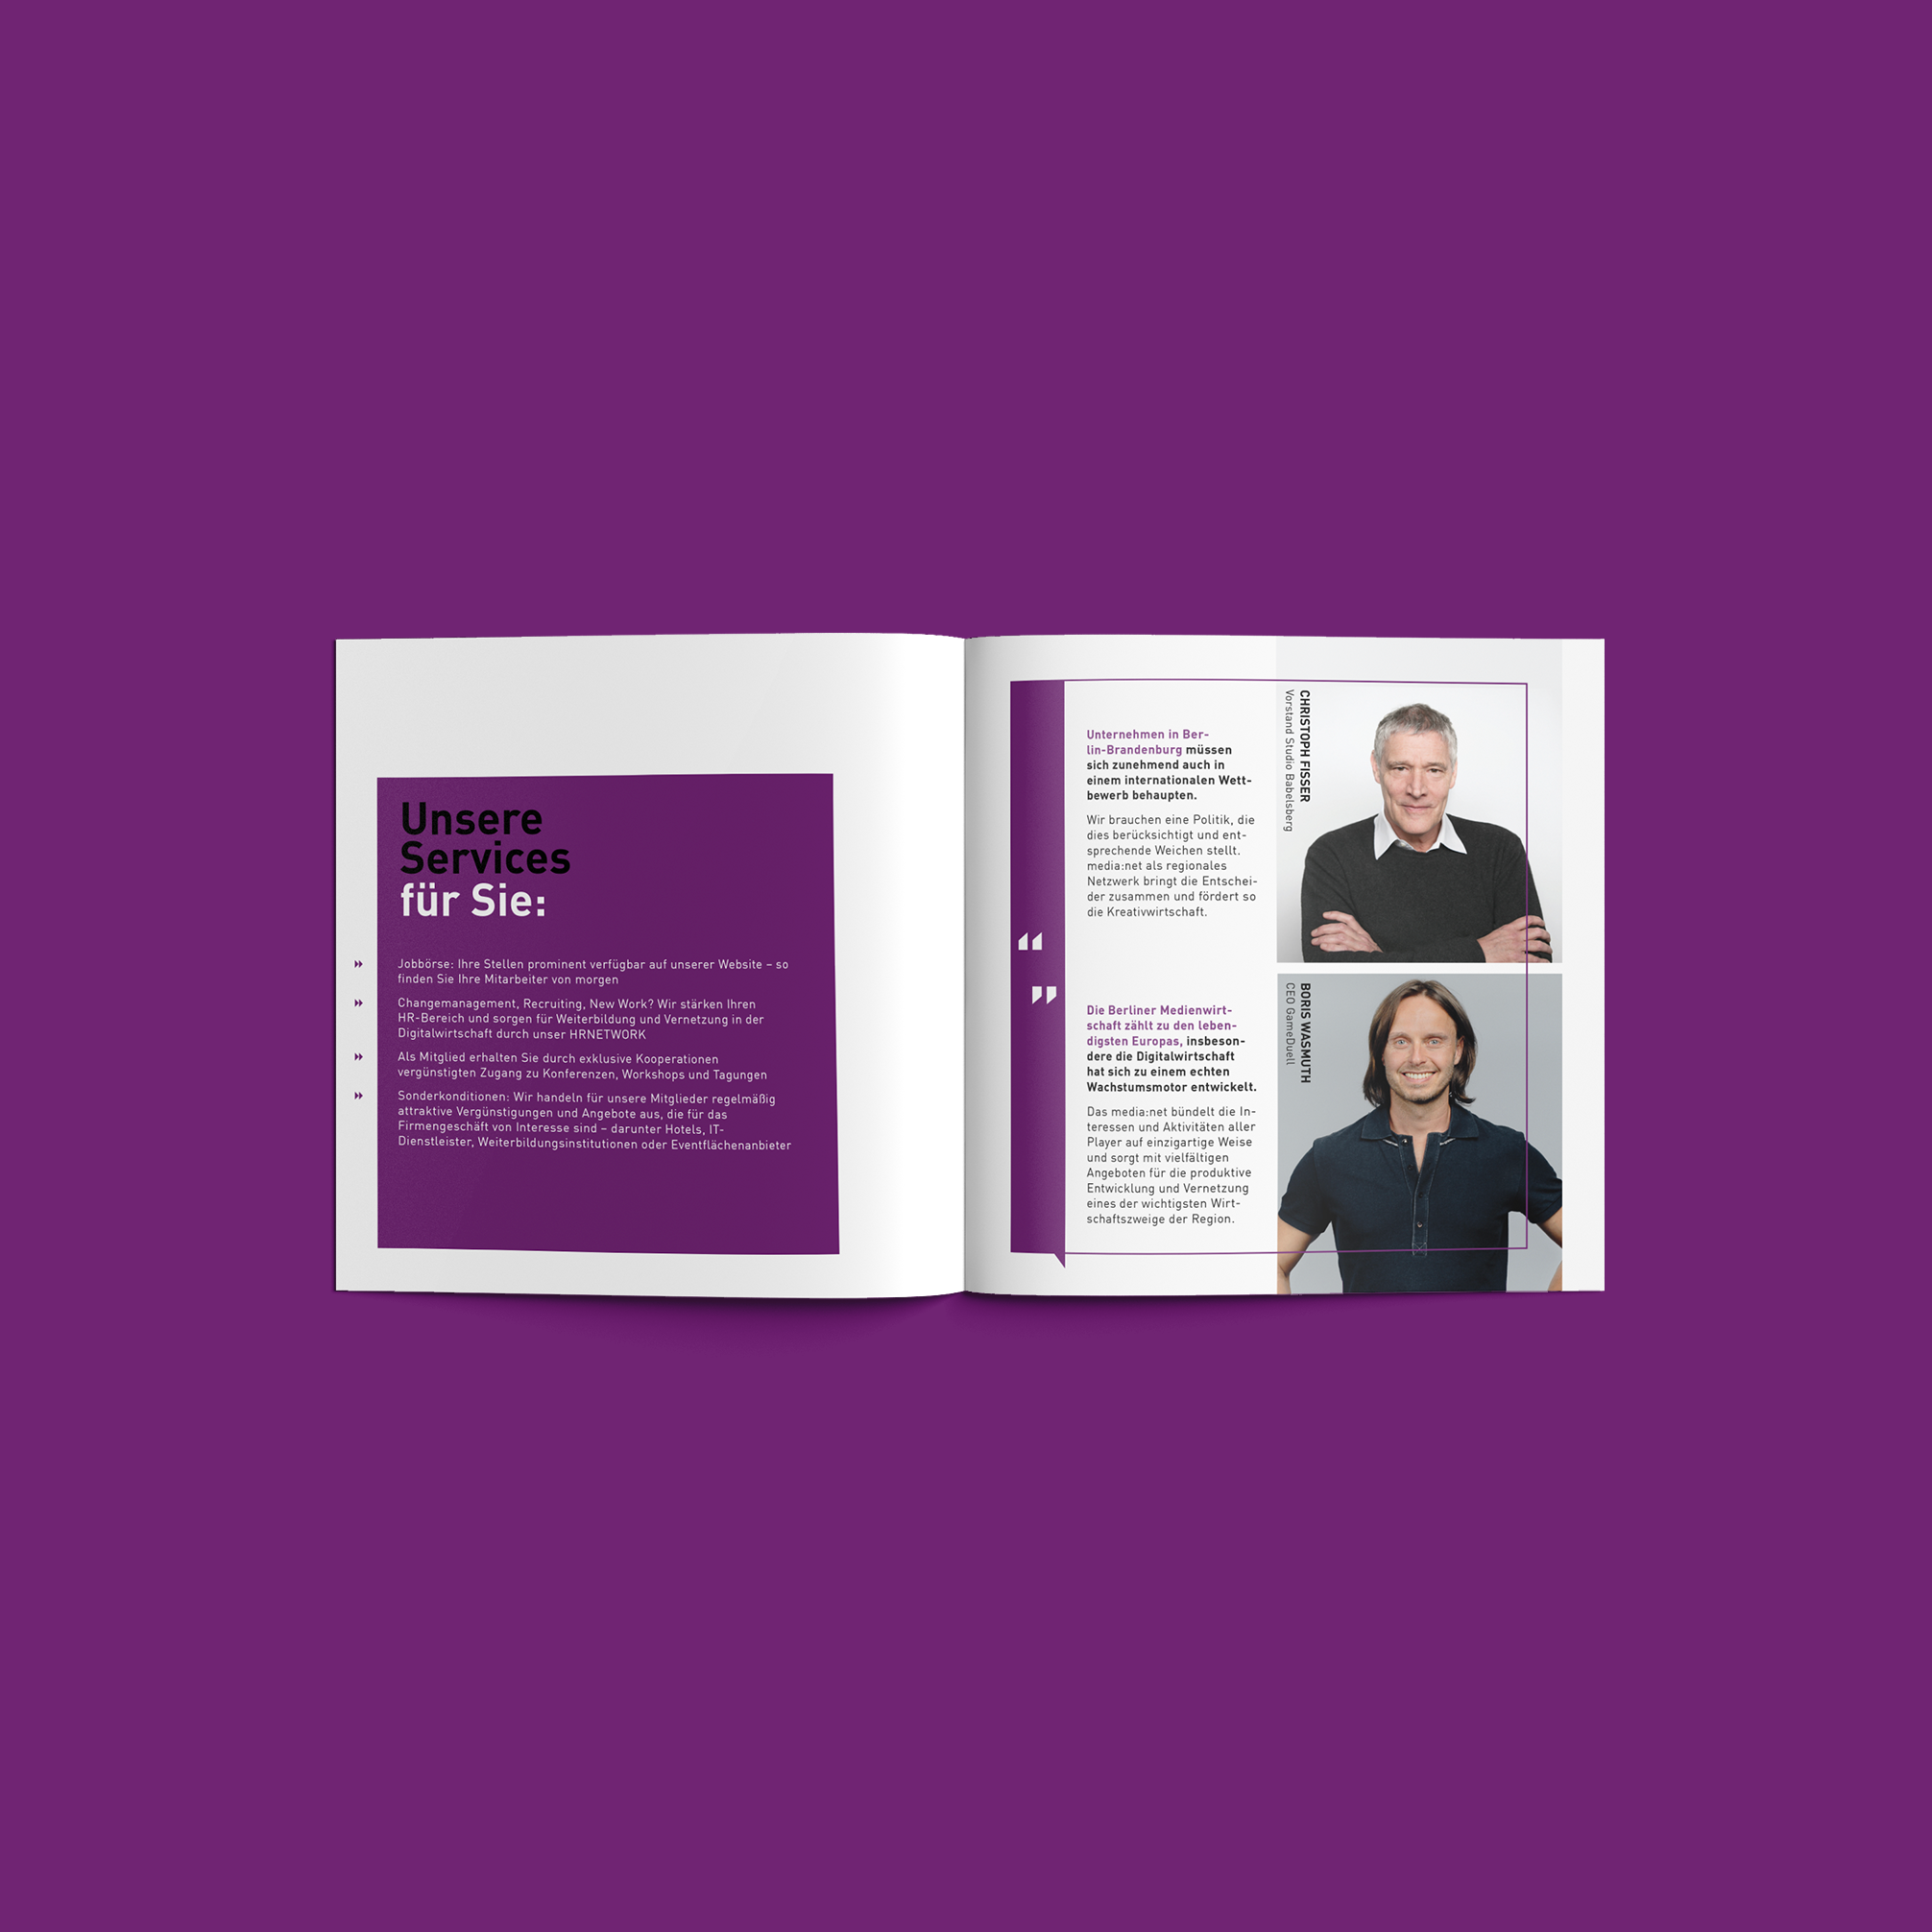 Media net berlinbrandenburg Business Broschüre   Redesign Corporate Design